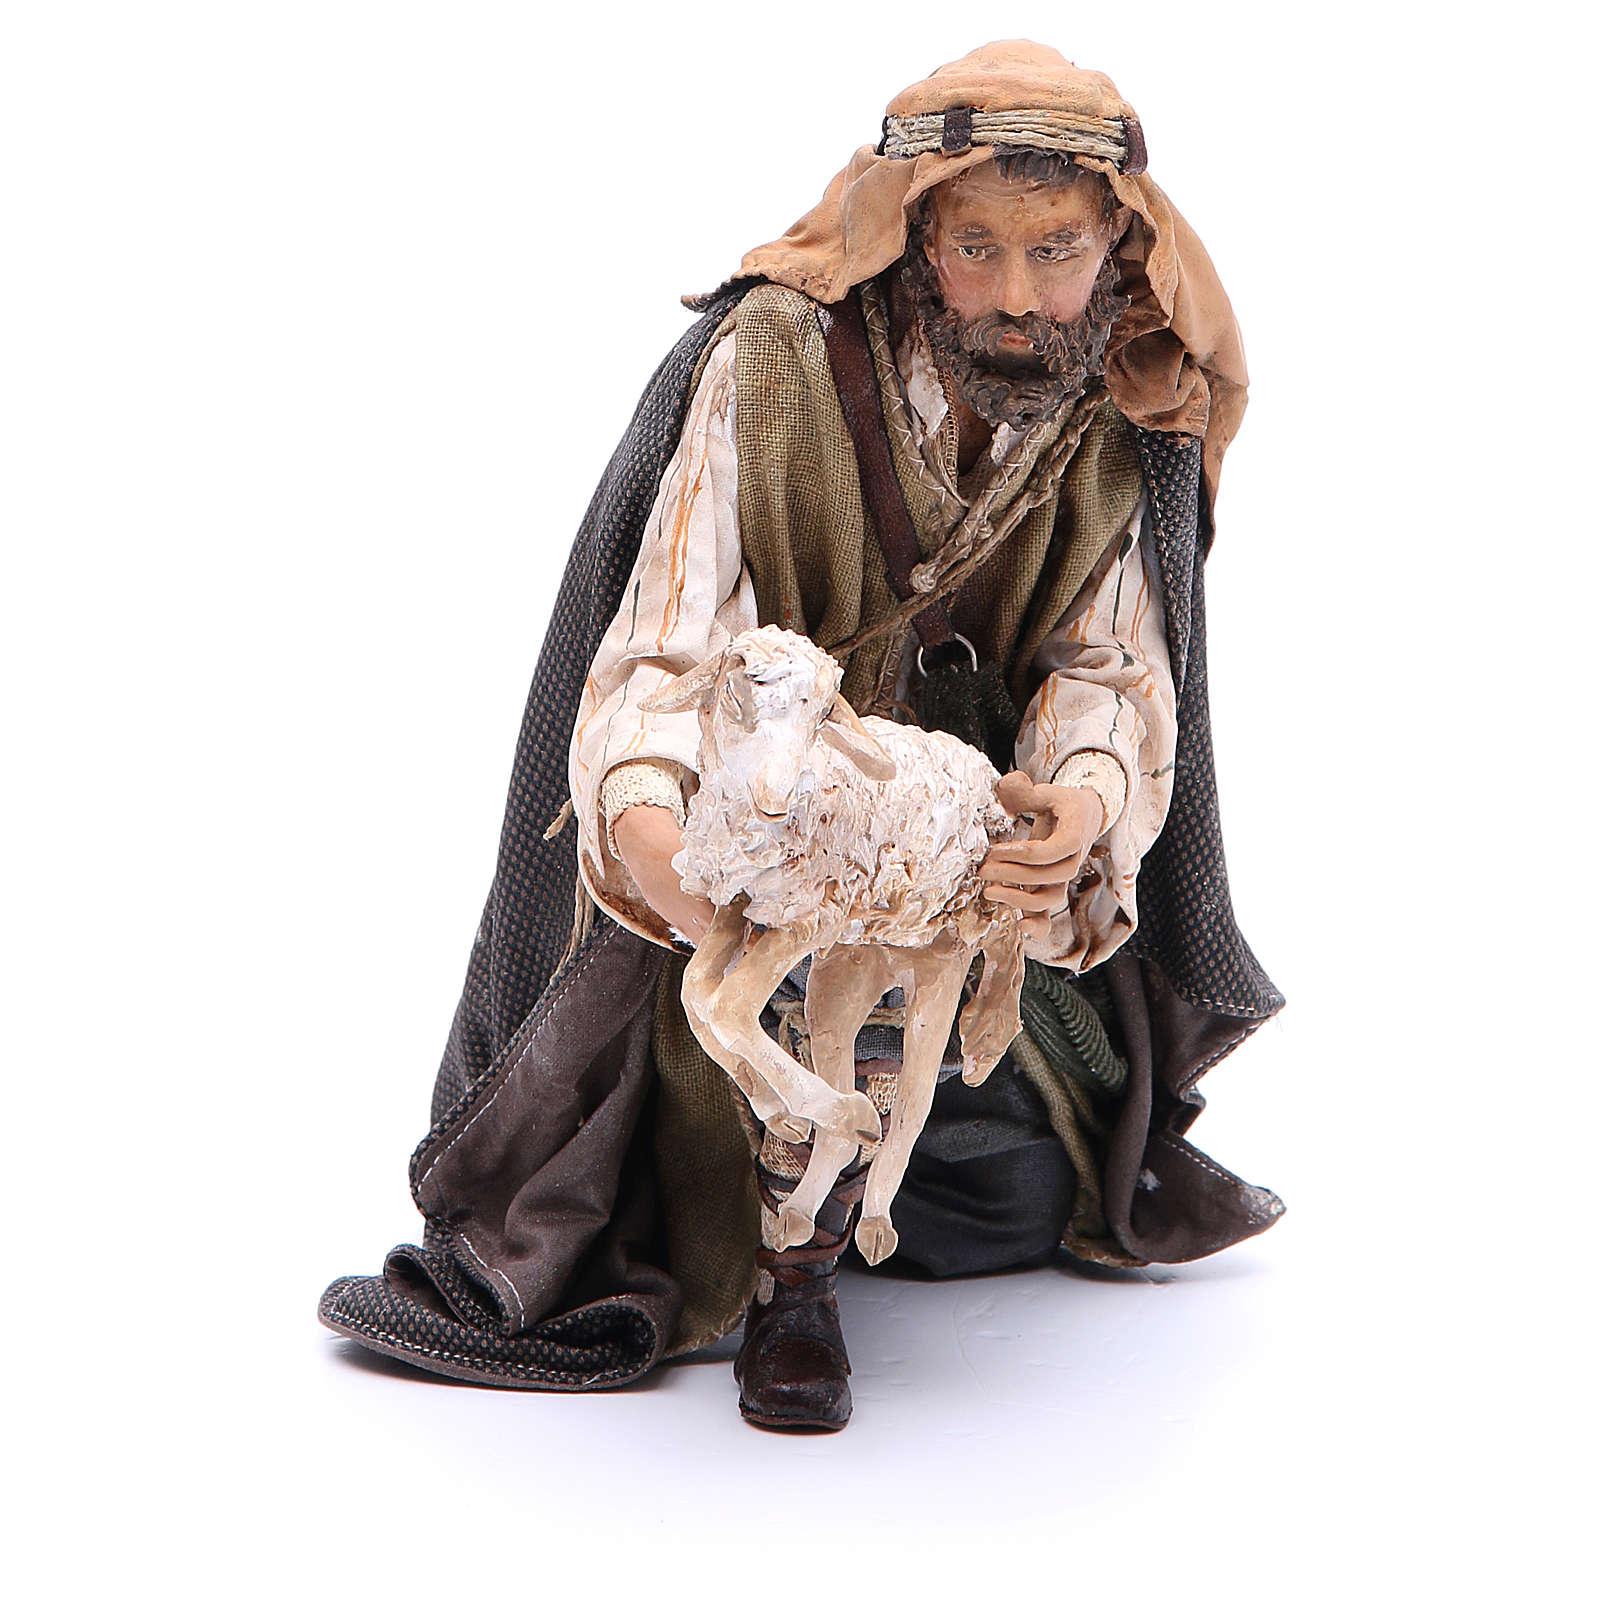 Pastore con capra 30 cm presepe Angela Tripi 4